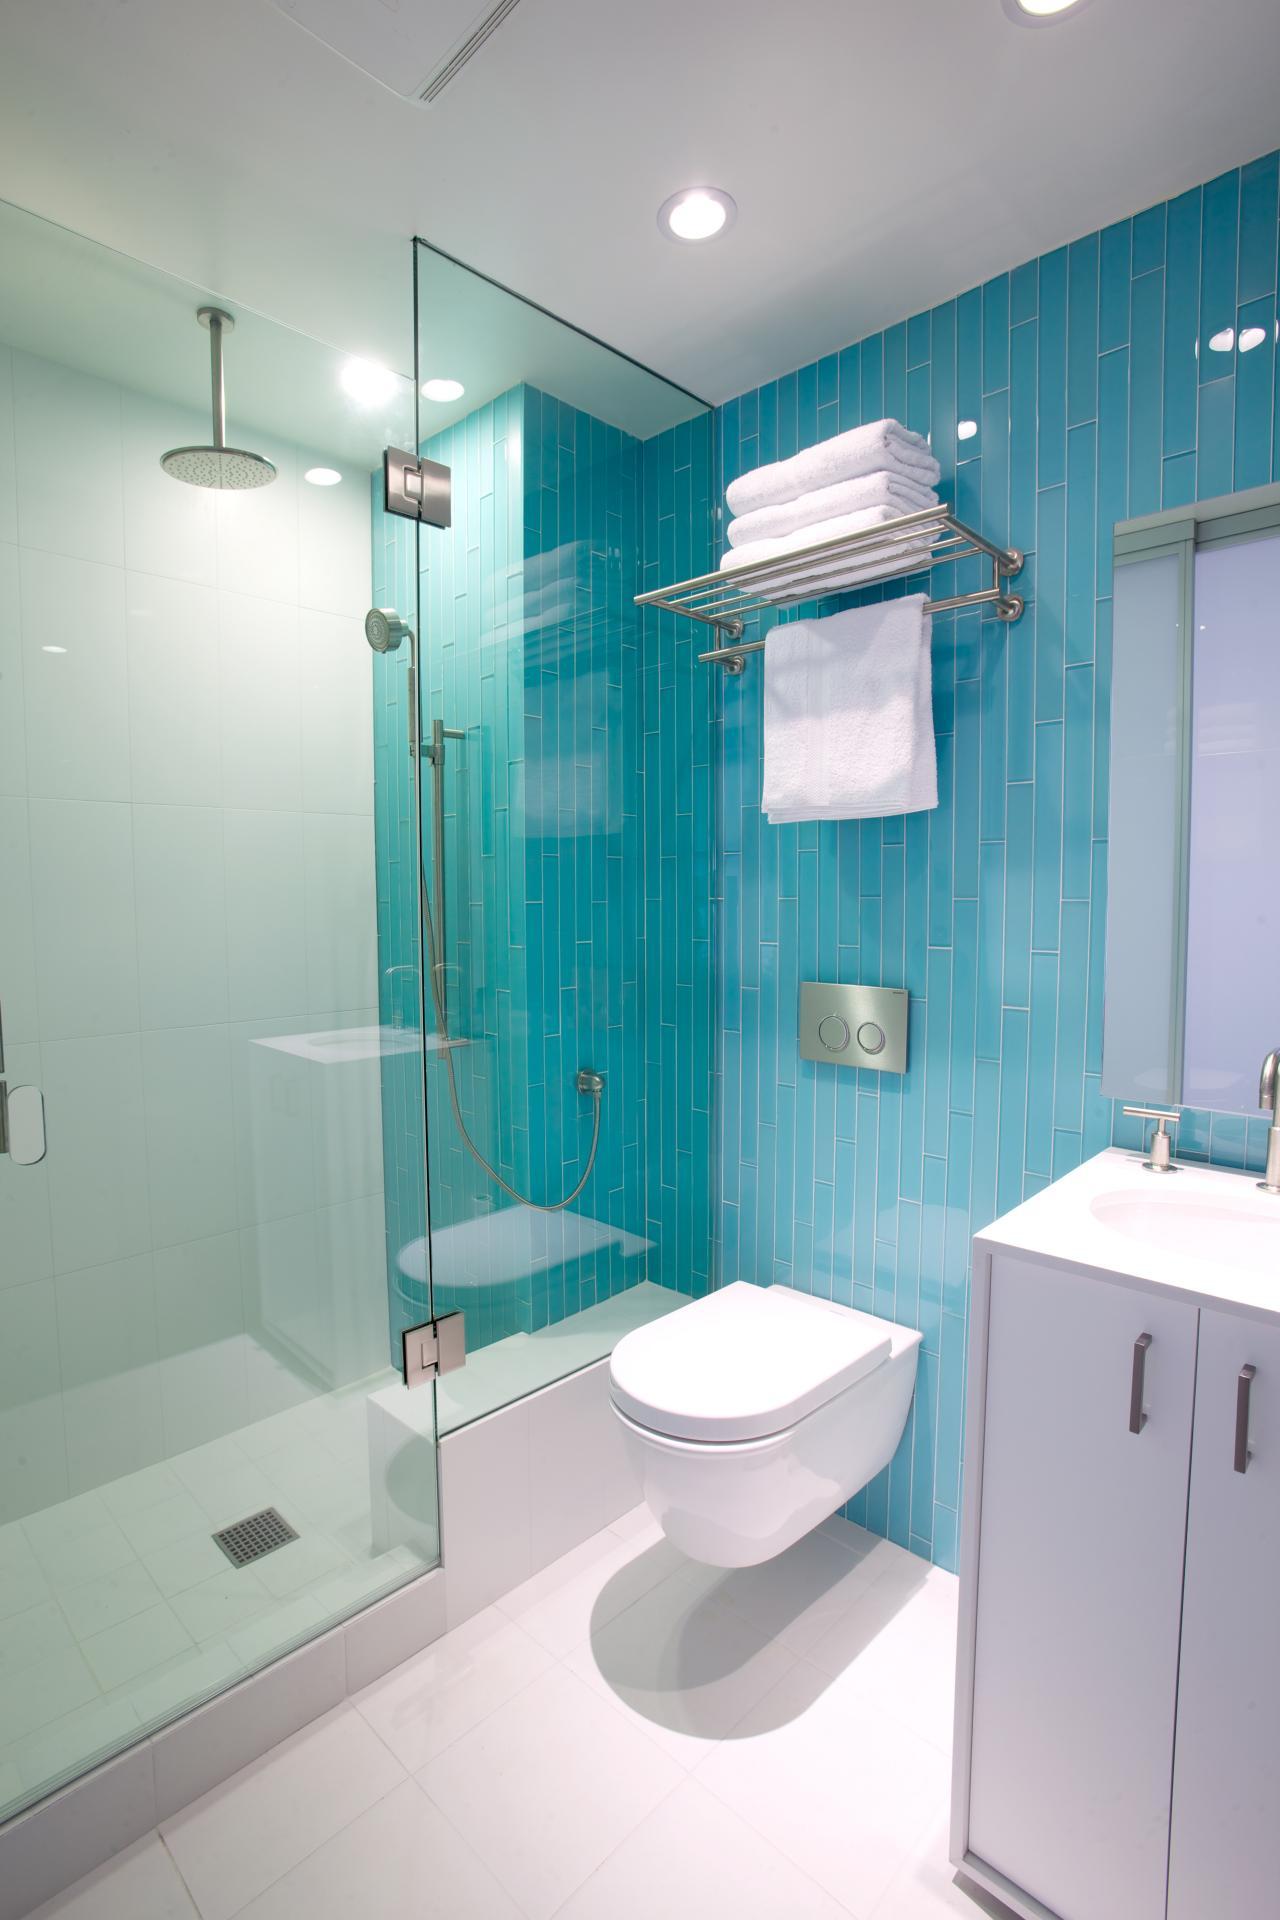 Clean Tile Shower Floor